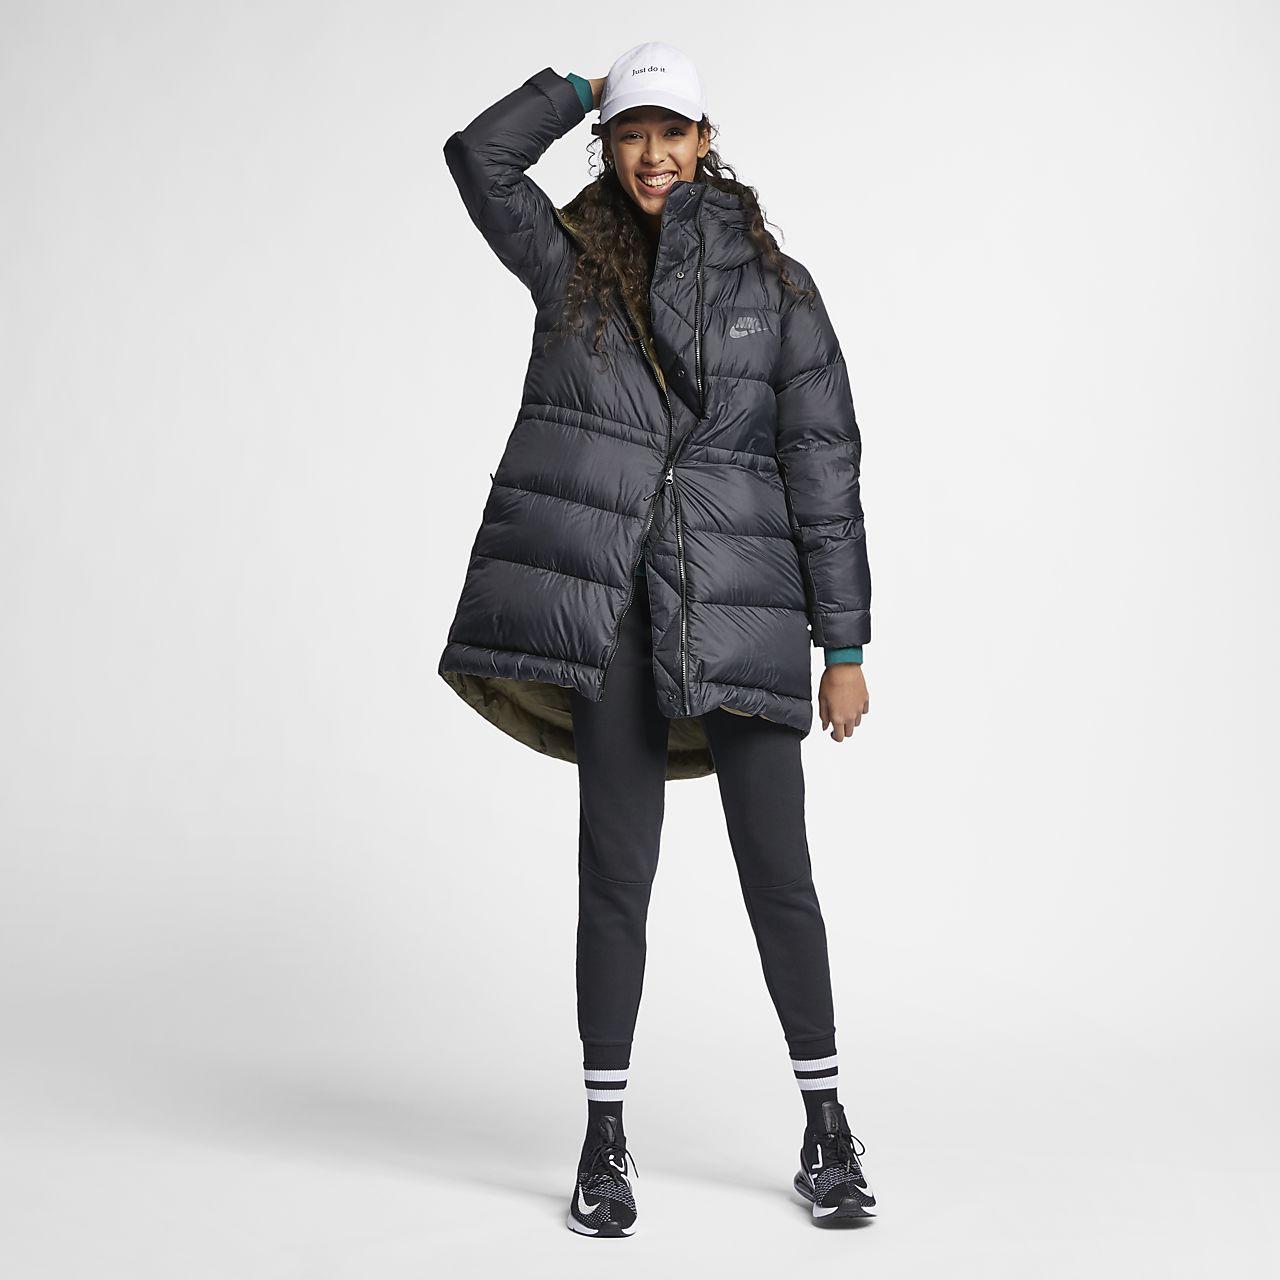 Femme Ma Pour Veste Duvet En Réversible Nike Sportswear yBYv0w e822b6f481d